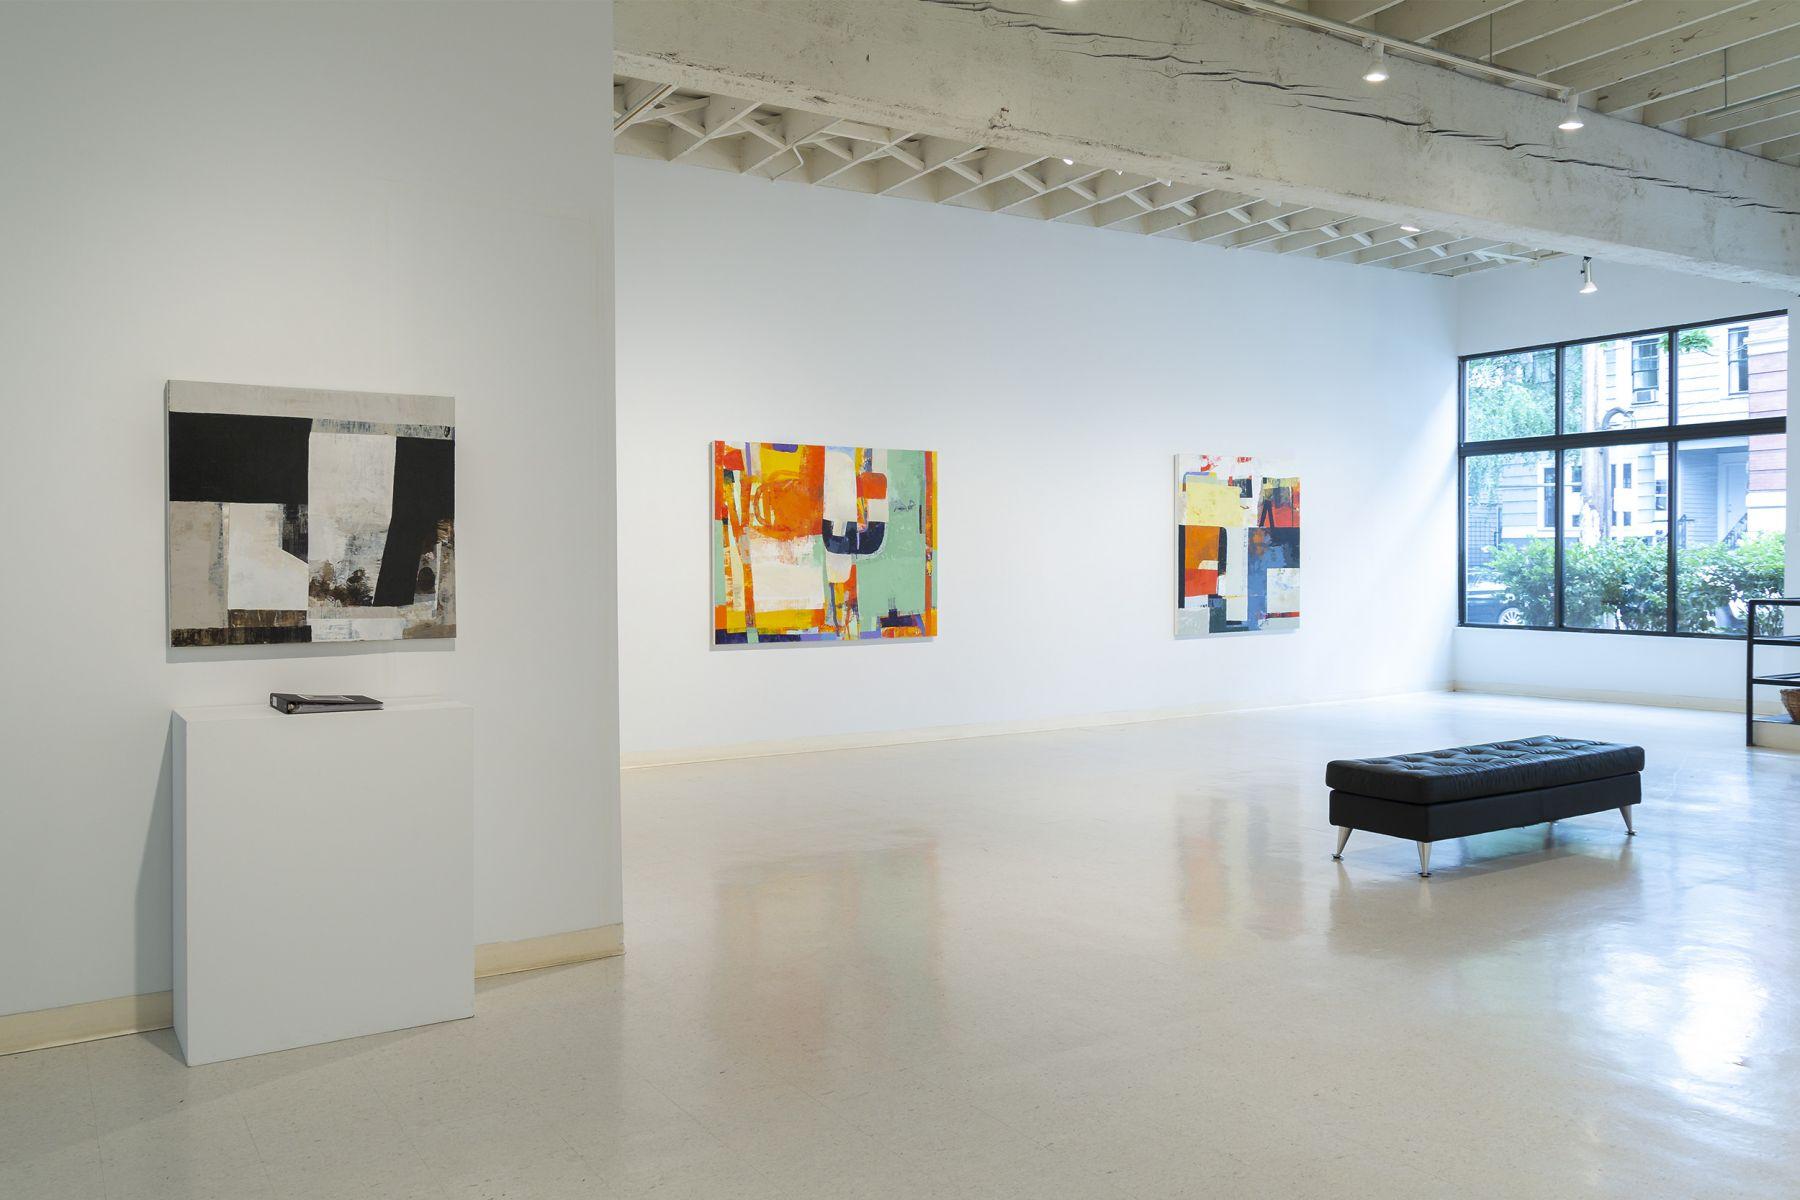 G. Lewis Clevenger - Minimis/Maximus - June 2019 - Installation View 04